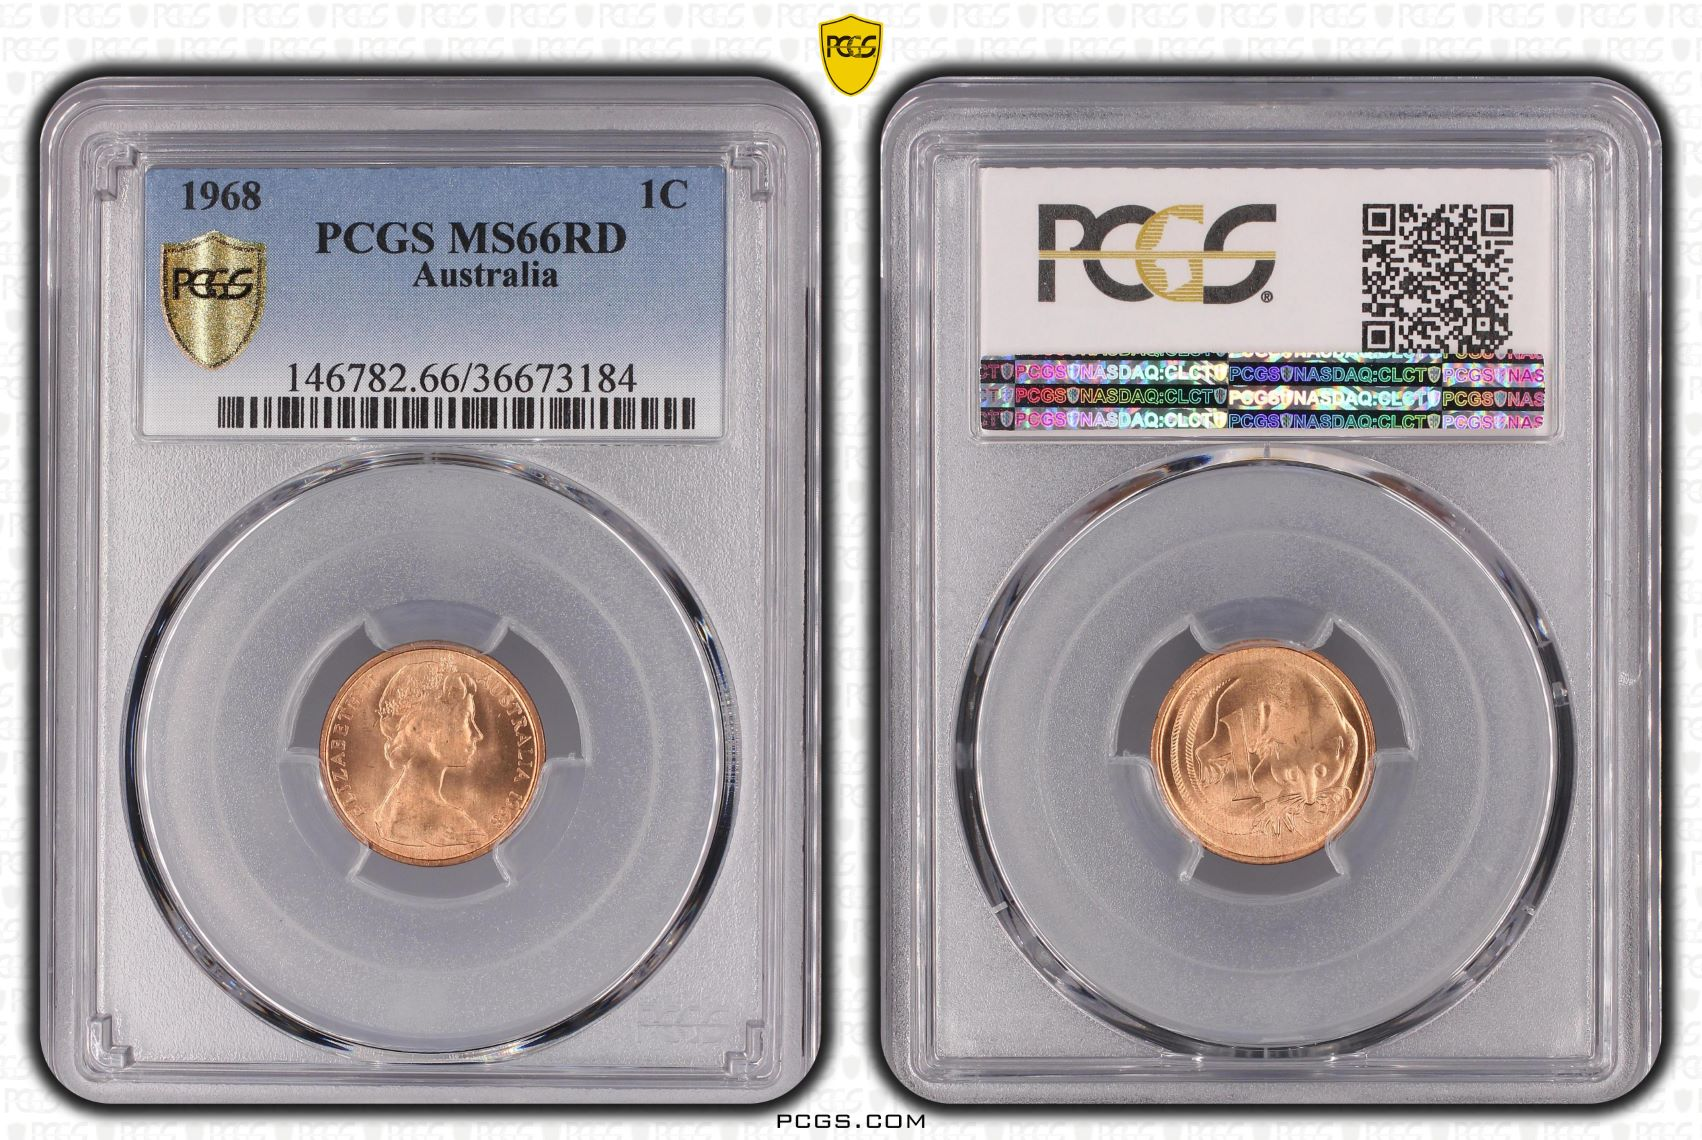 Australia 1968 1C One Cent PCGS MS66RD